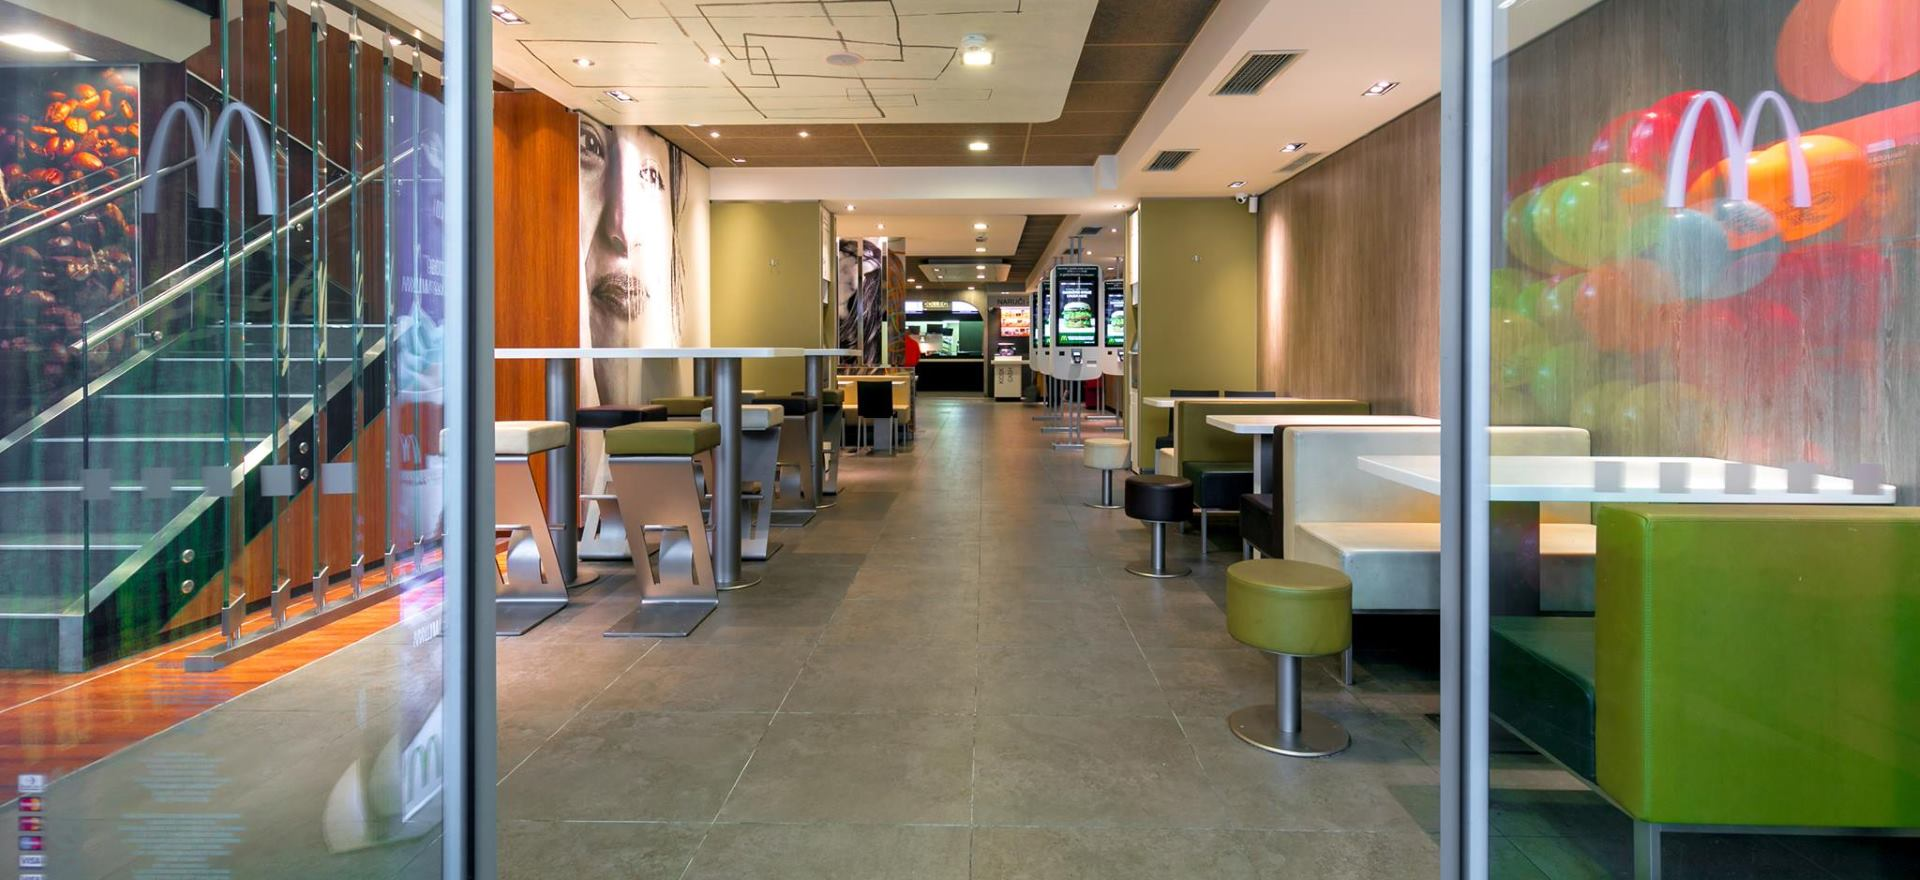 McDonald's Hrvatska želi zabaviti svoje goste